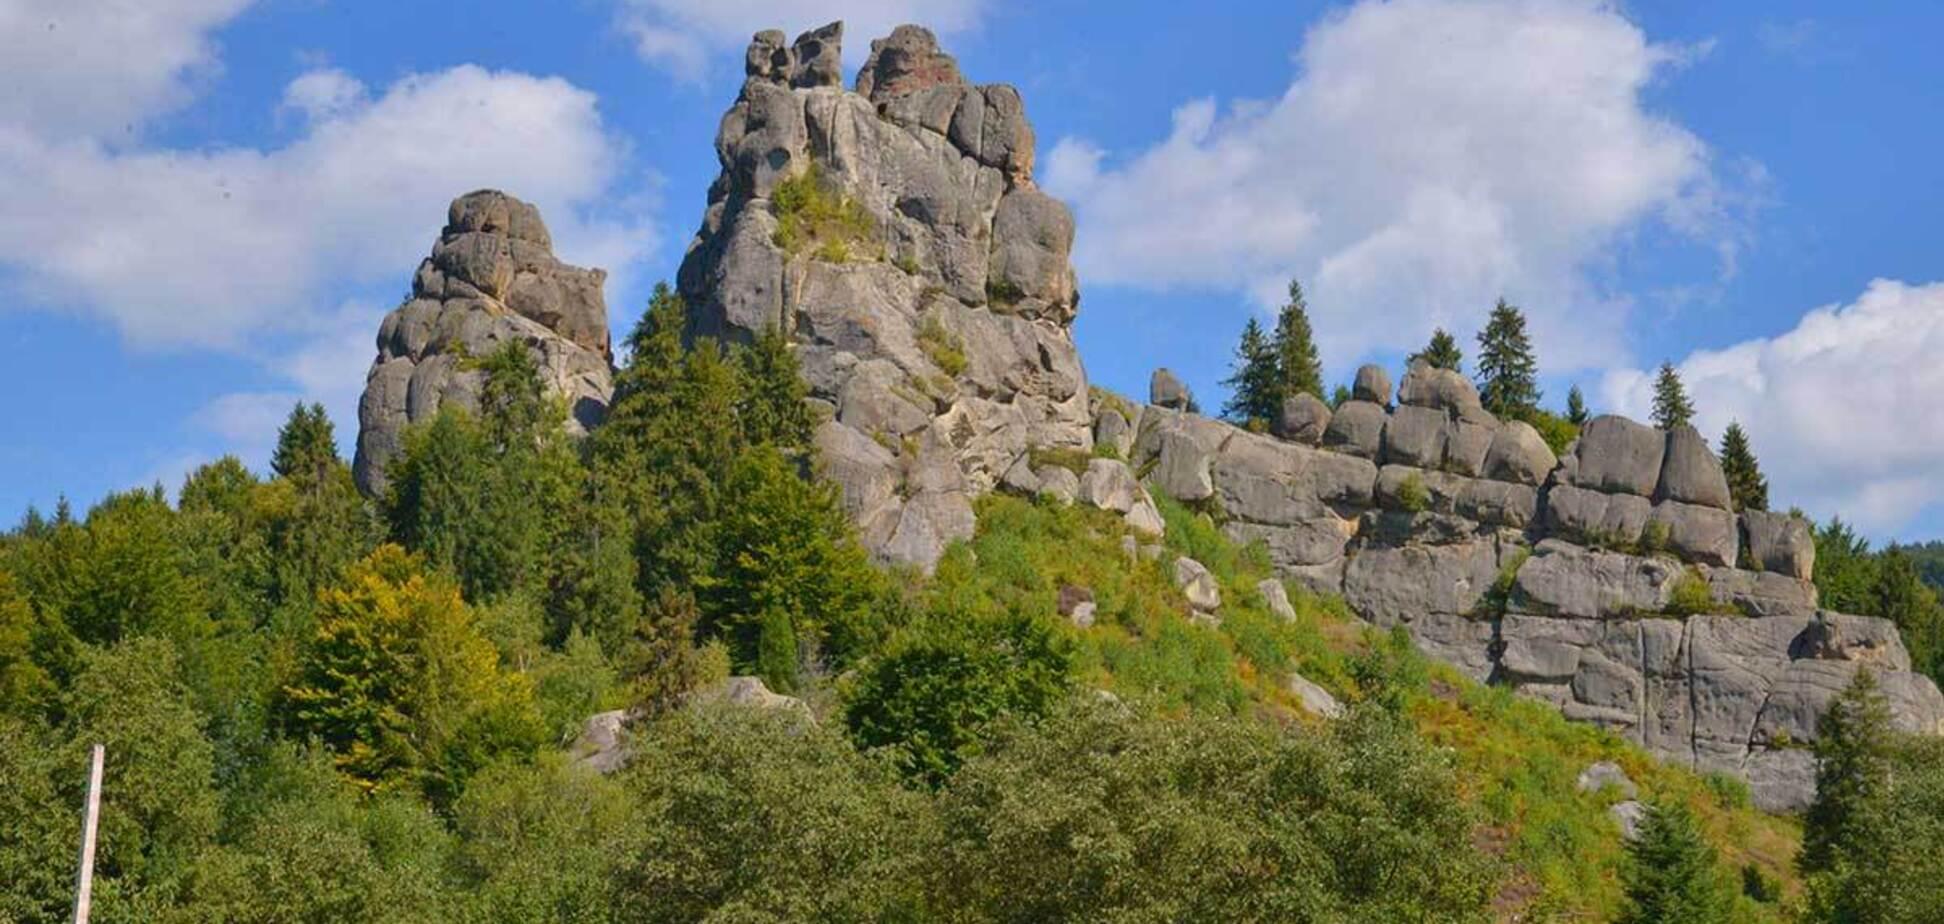 Топ поисков Google: Тустань – таможенный пост на древних скалах